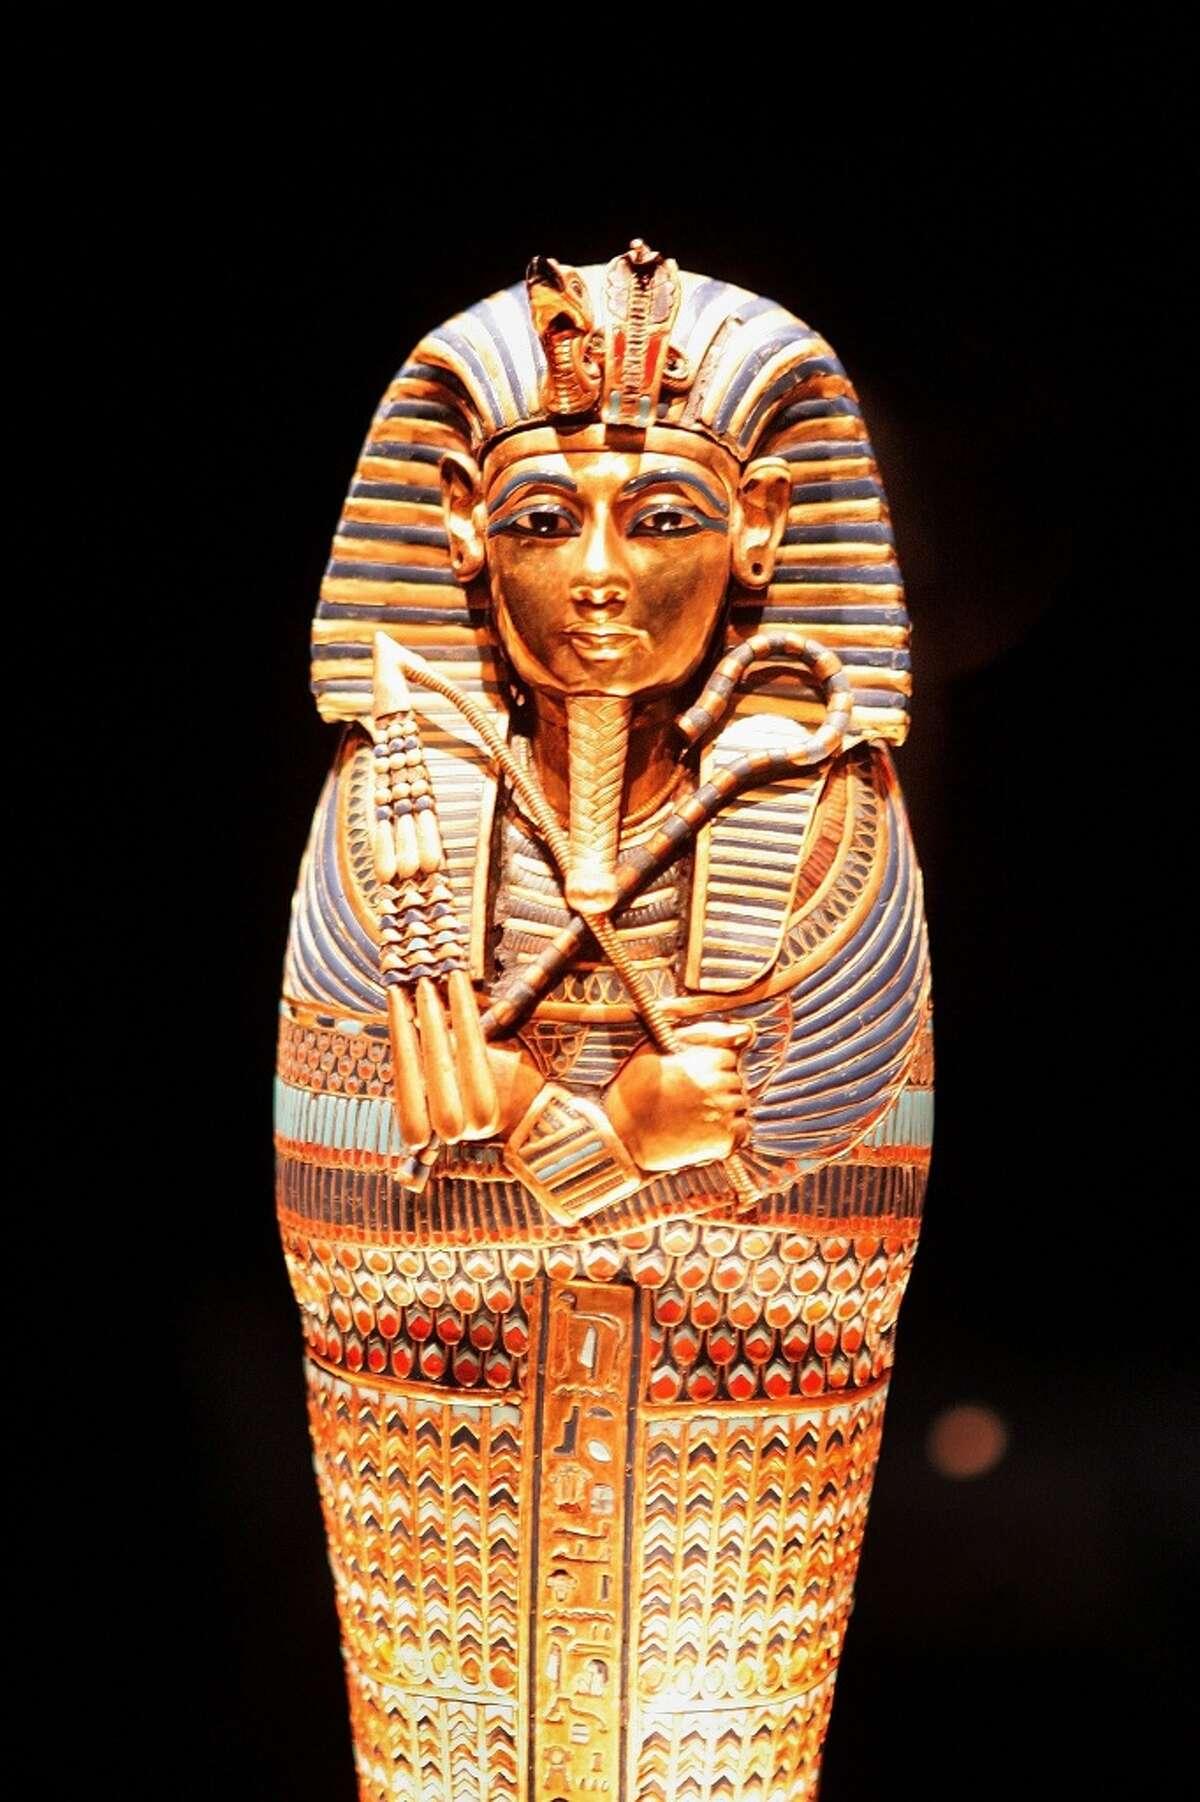 King Tutankhamen Analysis of King Tut's mummy revealed he had TB.